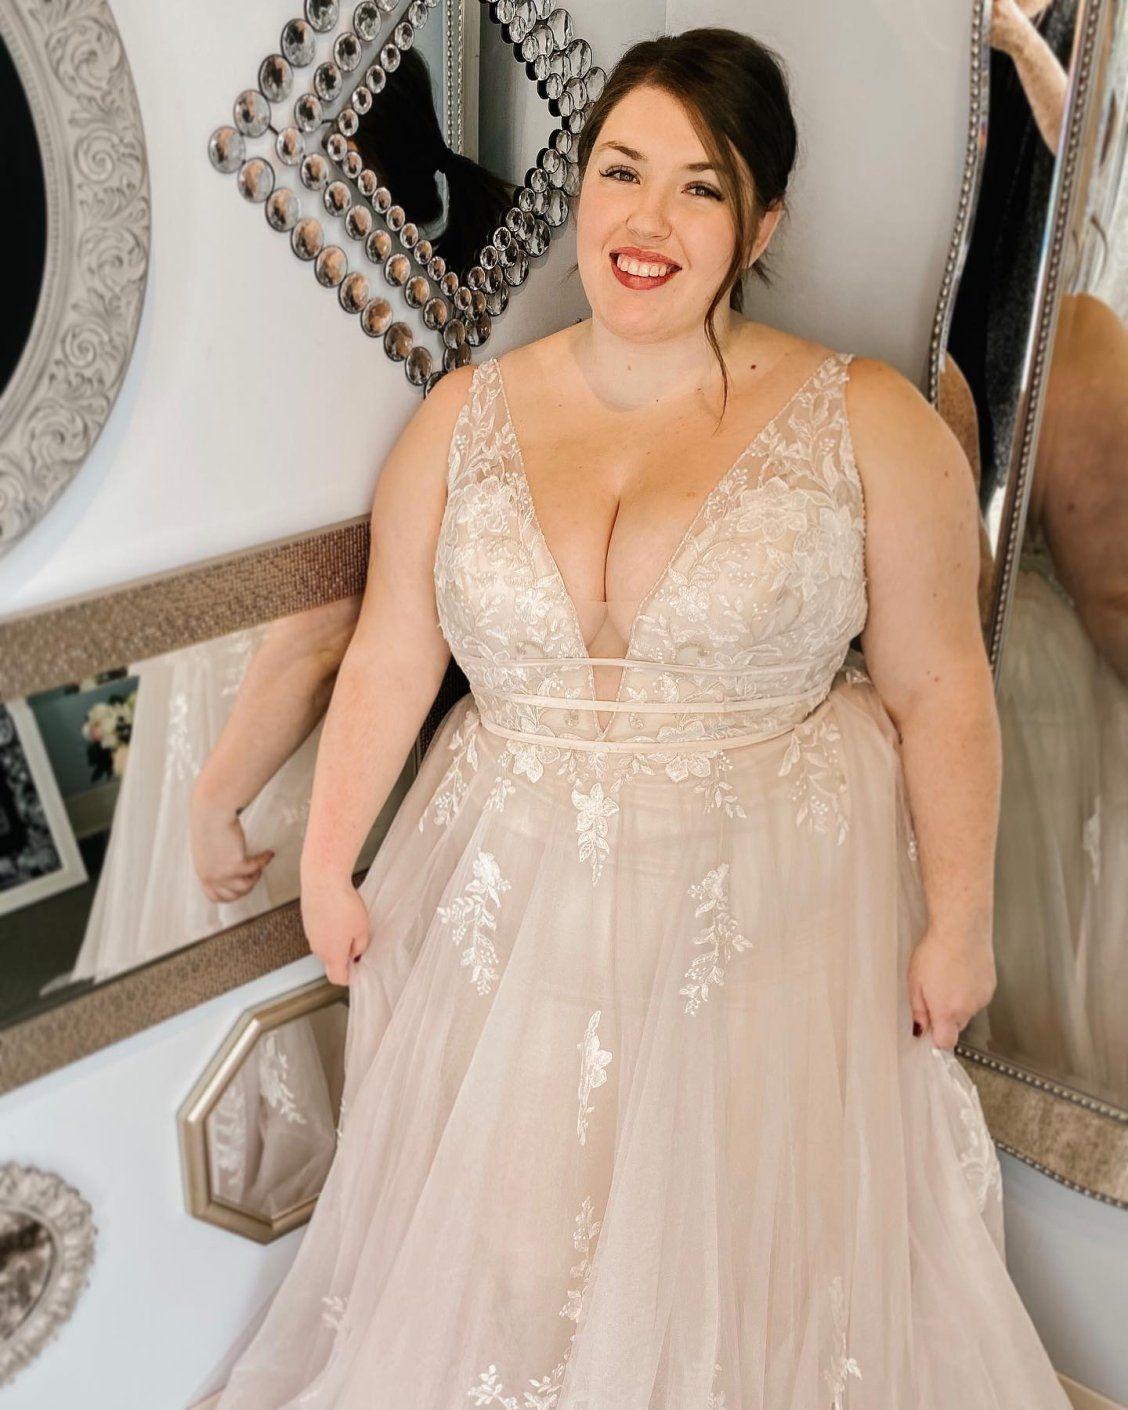 Pin On Plus Size Wedding Dresses [ 1410 x 1128 Pixel ]